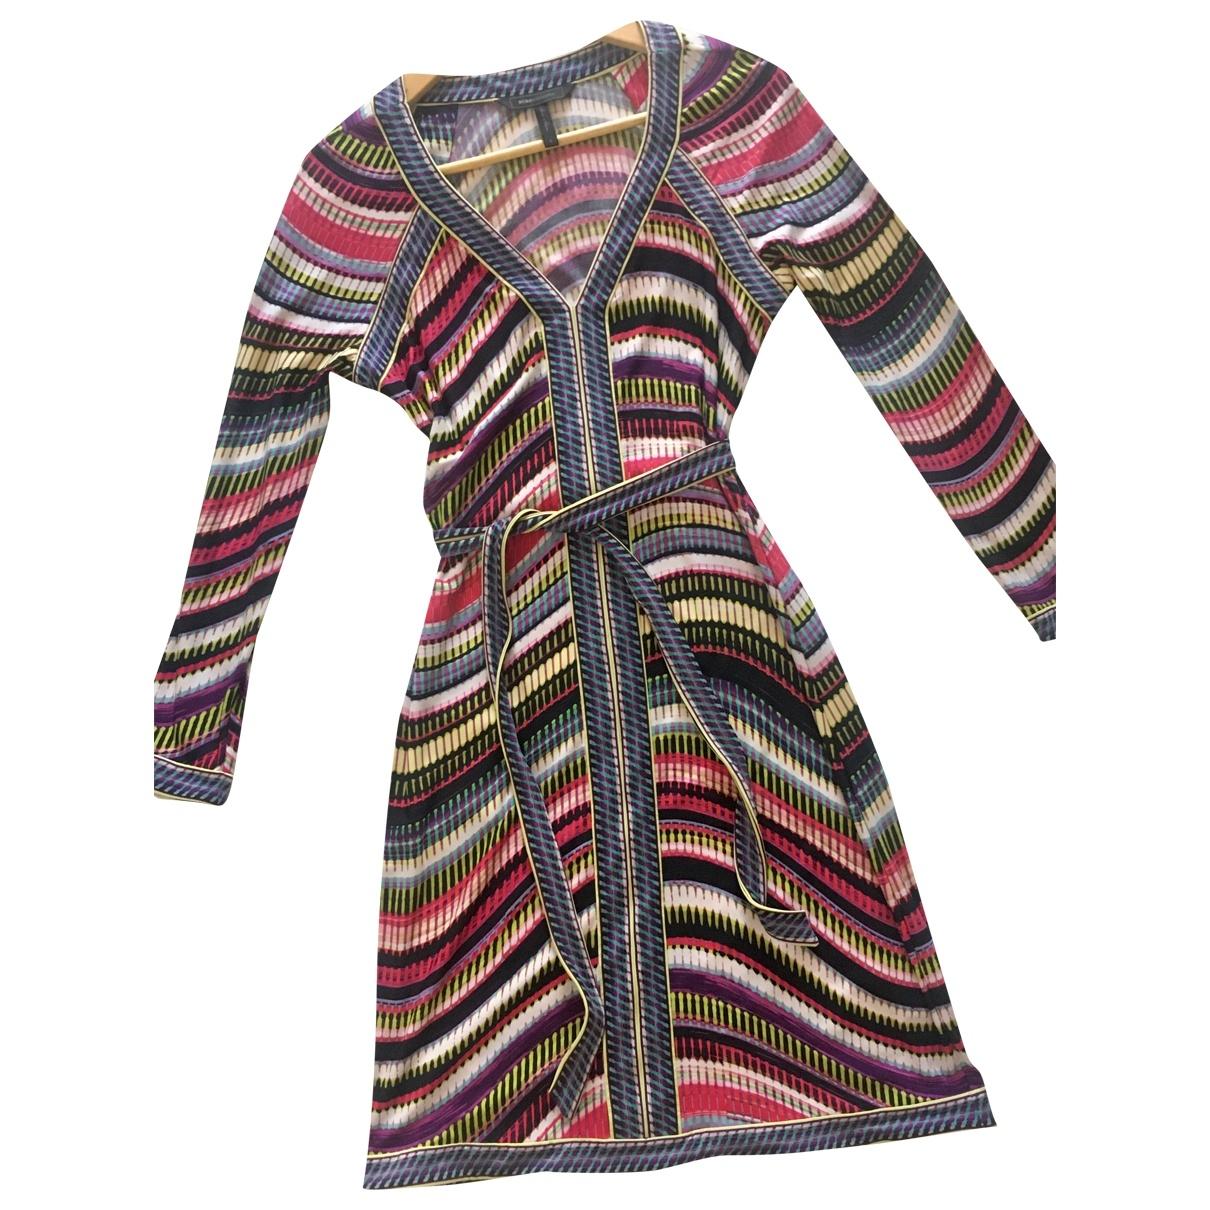 Bcbg Max Azria \N Multicolour dress for Women 4 US